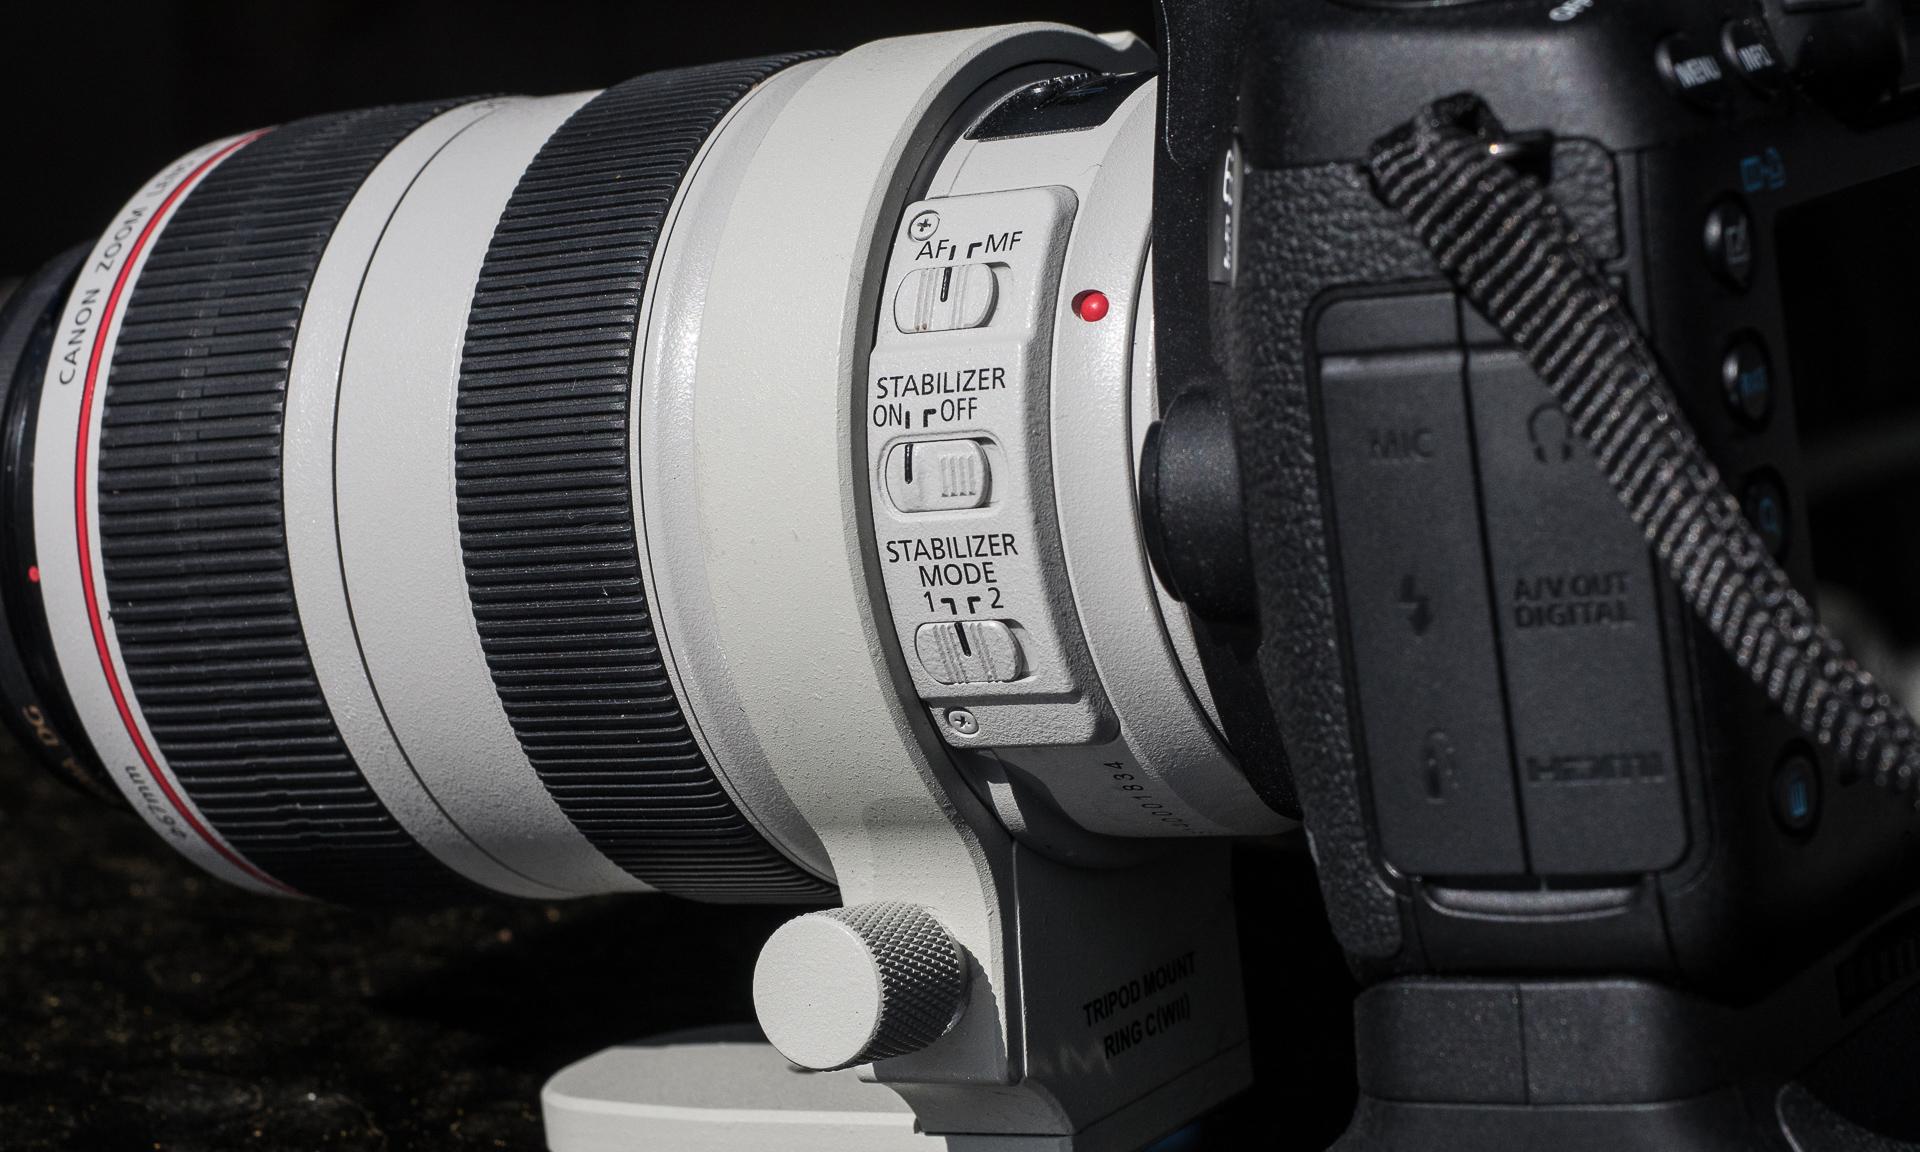 Bildestabilisator i objektiv og kamera